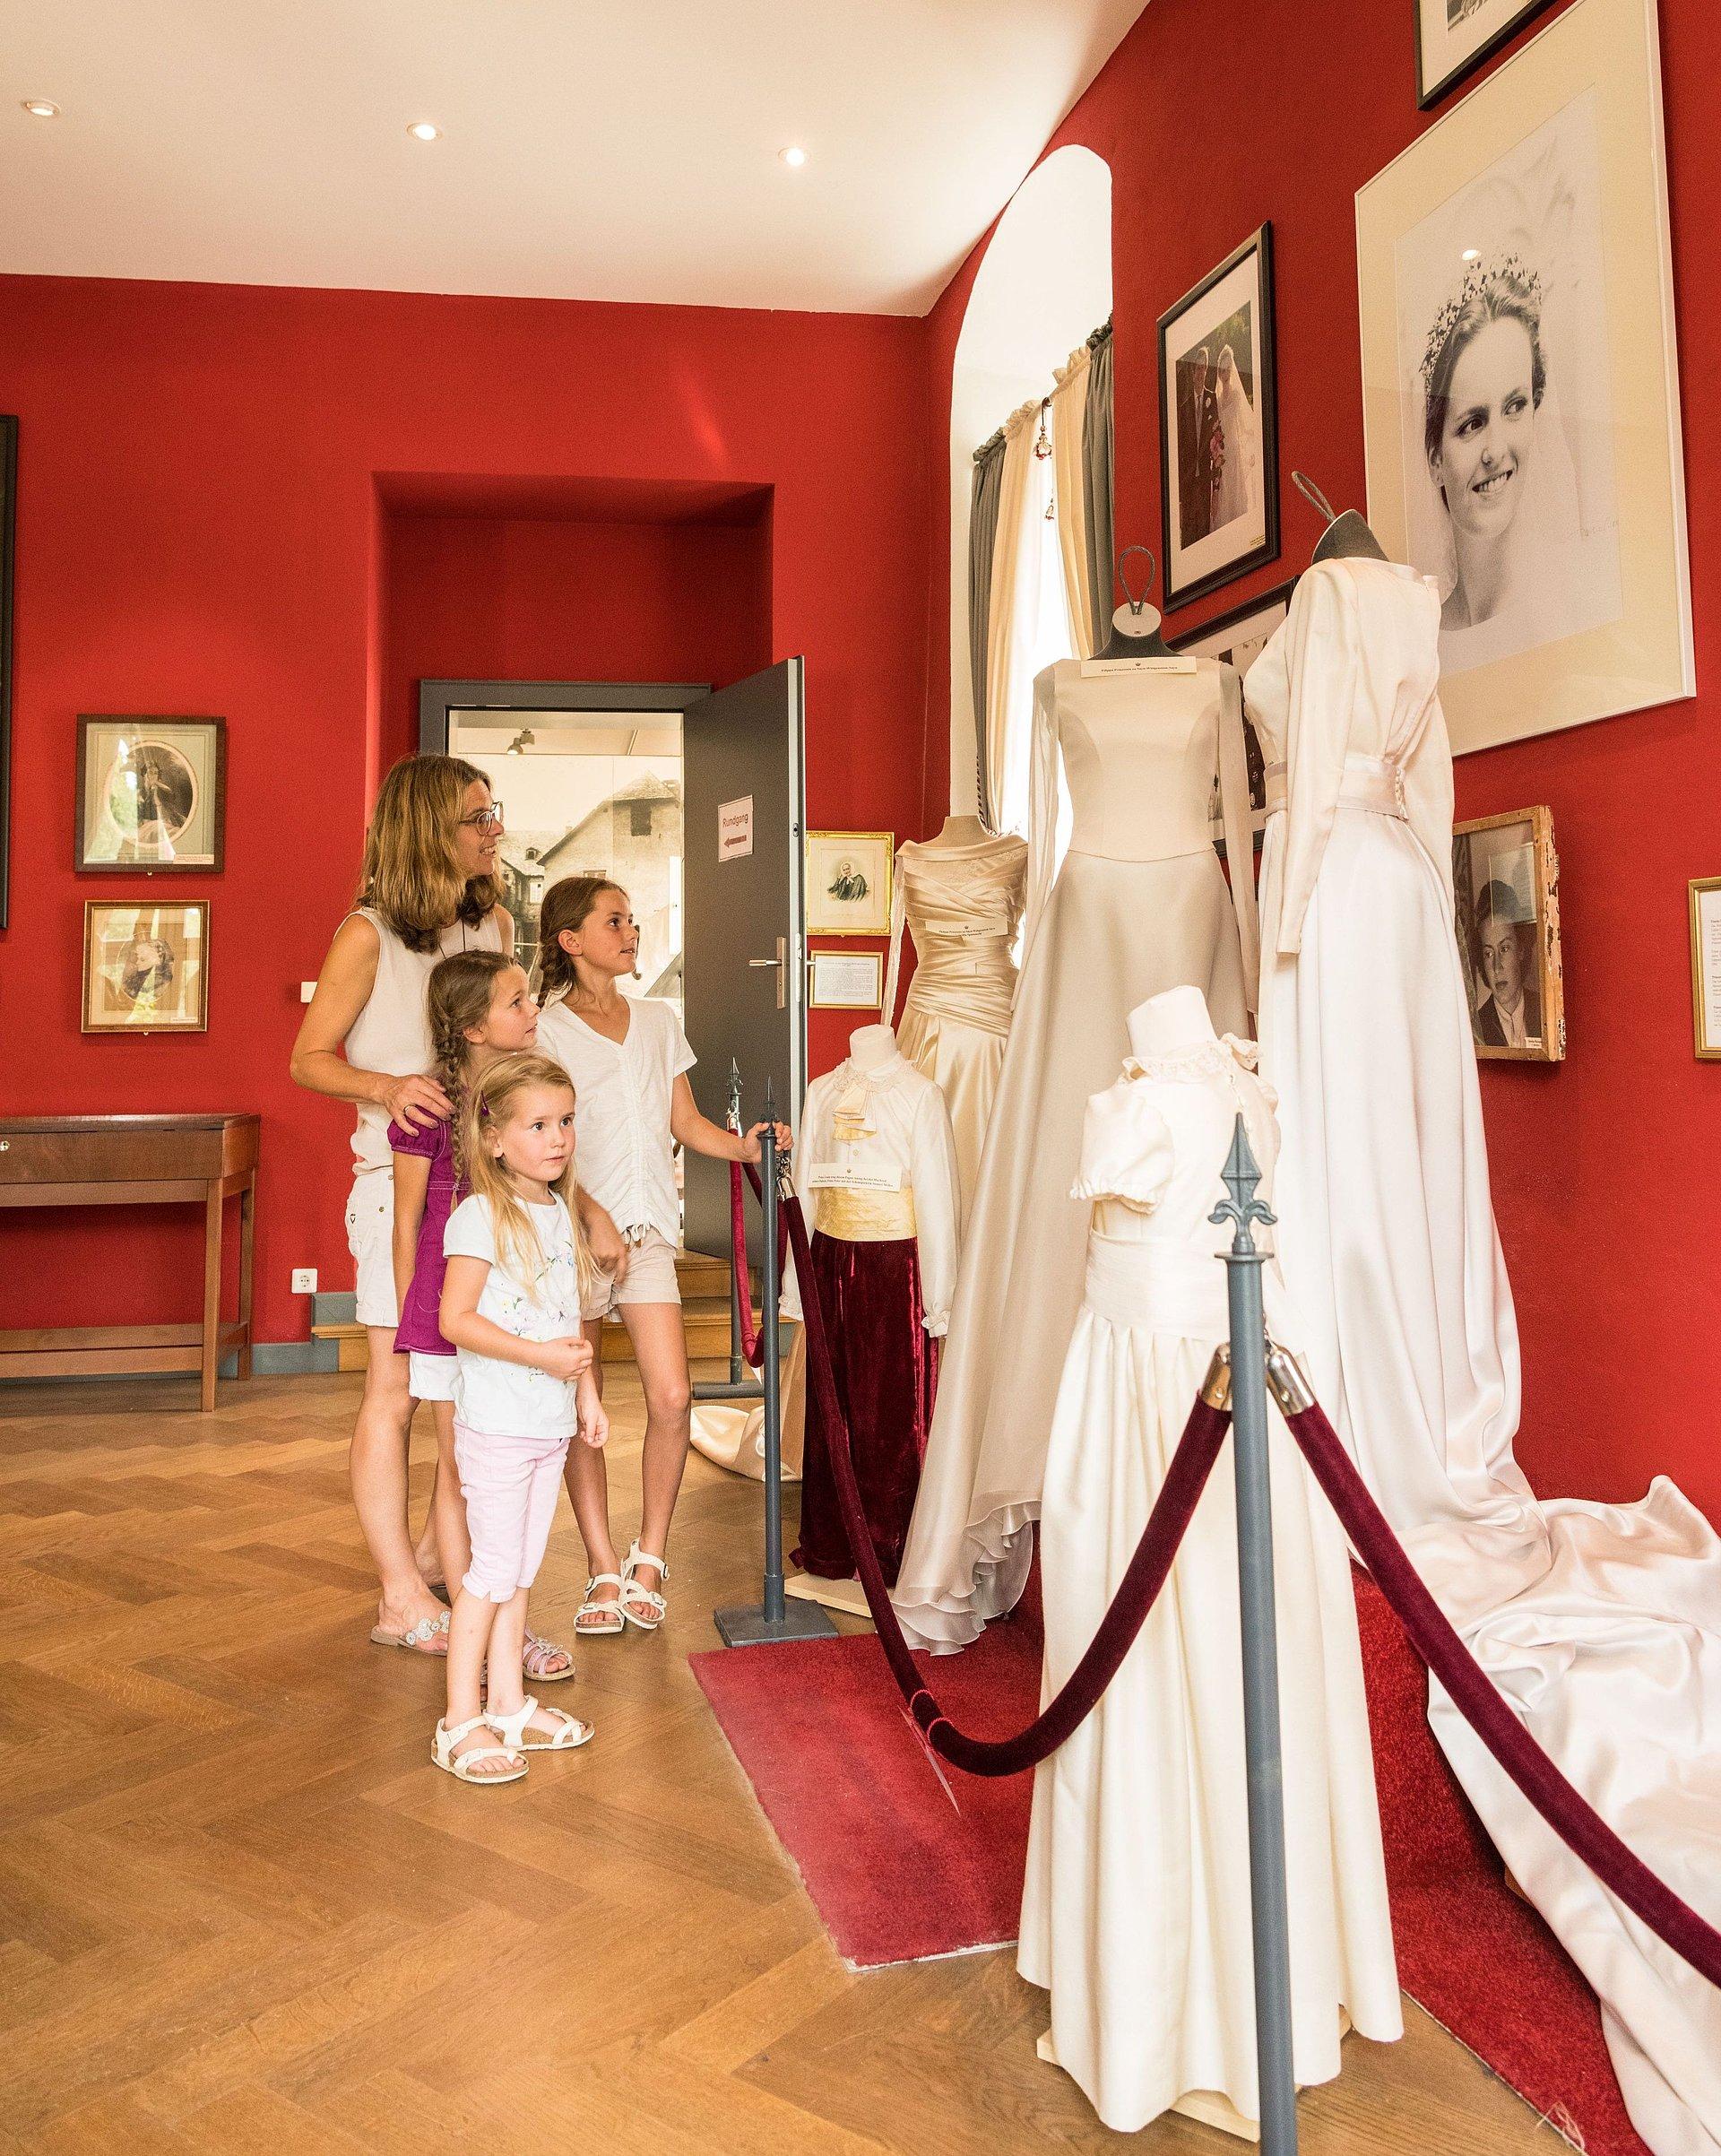 Museum im Schloss Sayn in Bendorf-Sayn, Romantischer Rhein